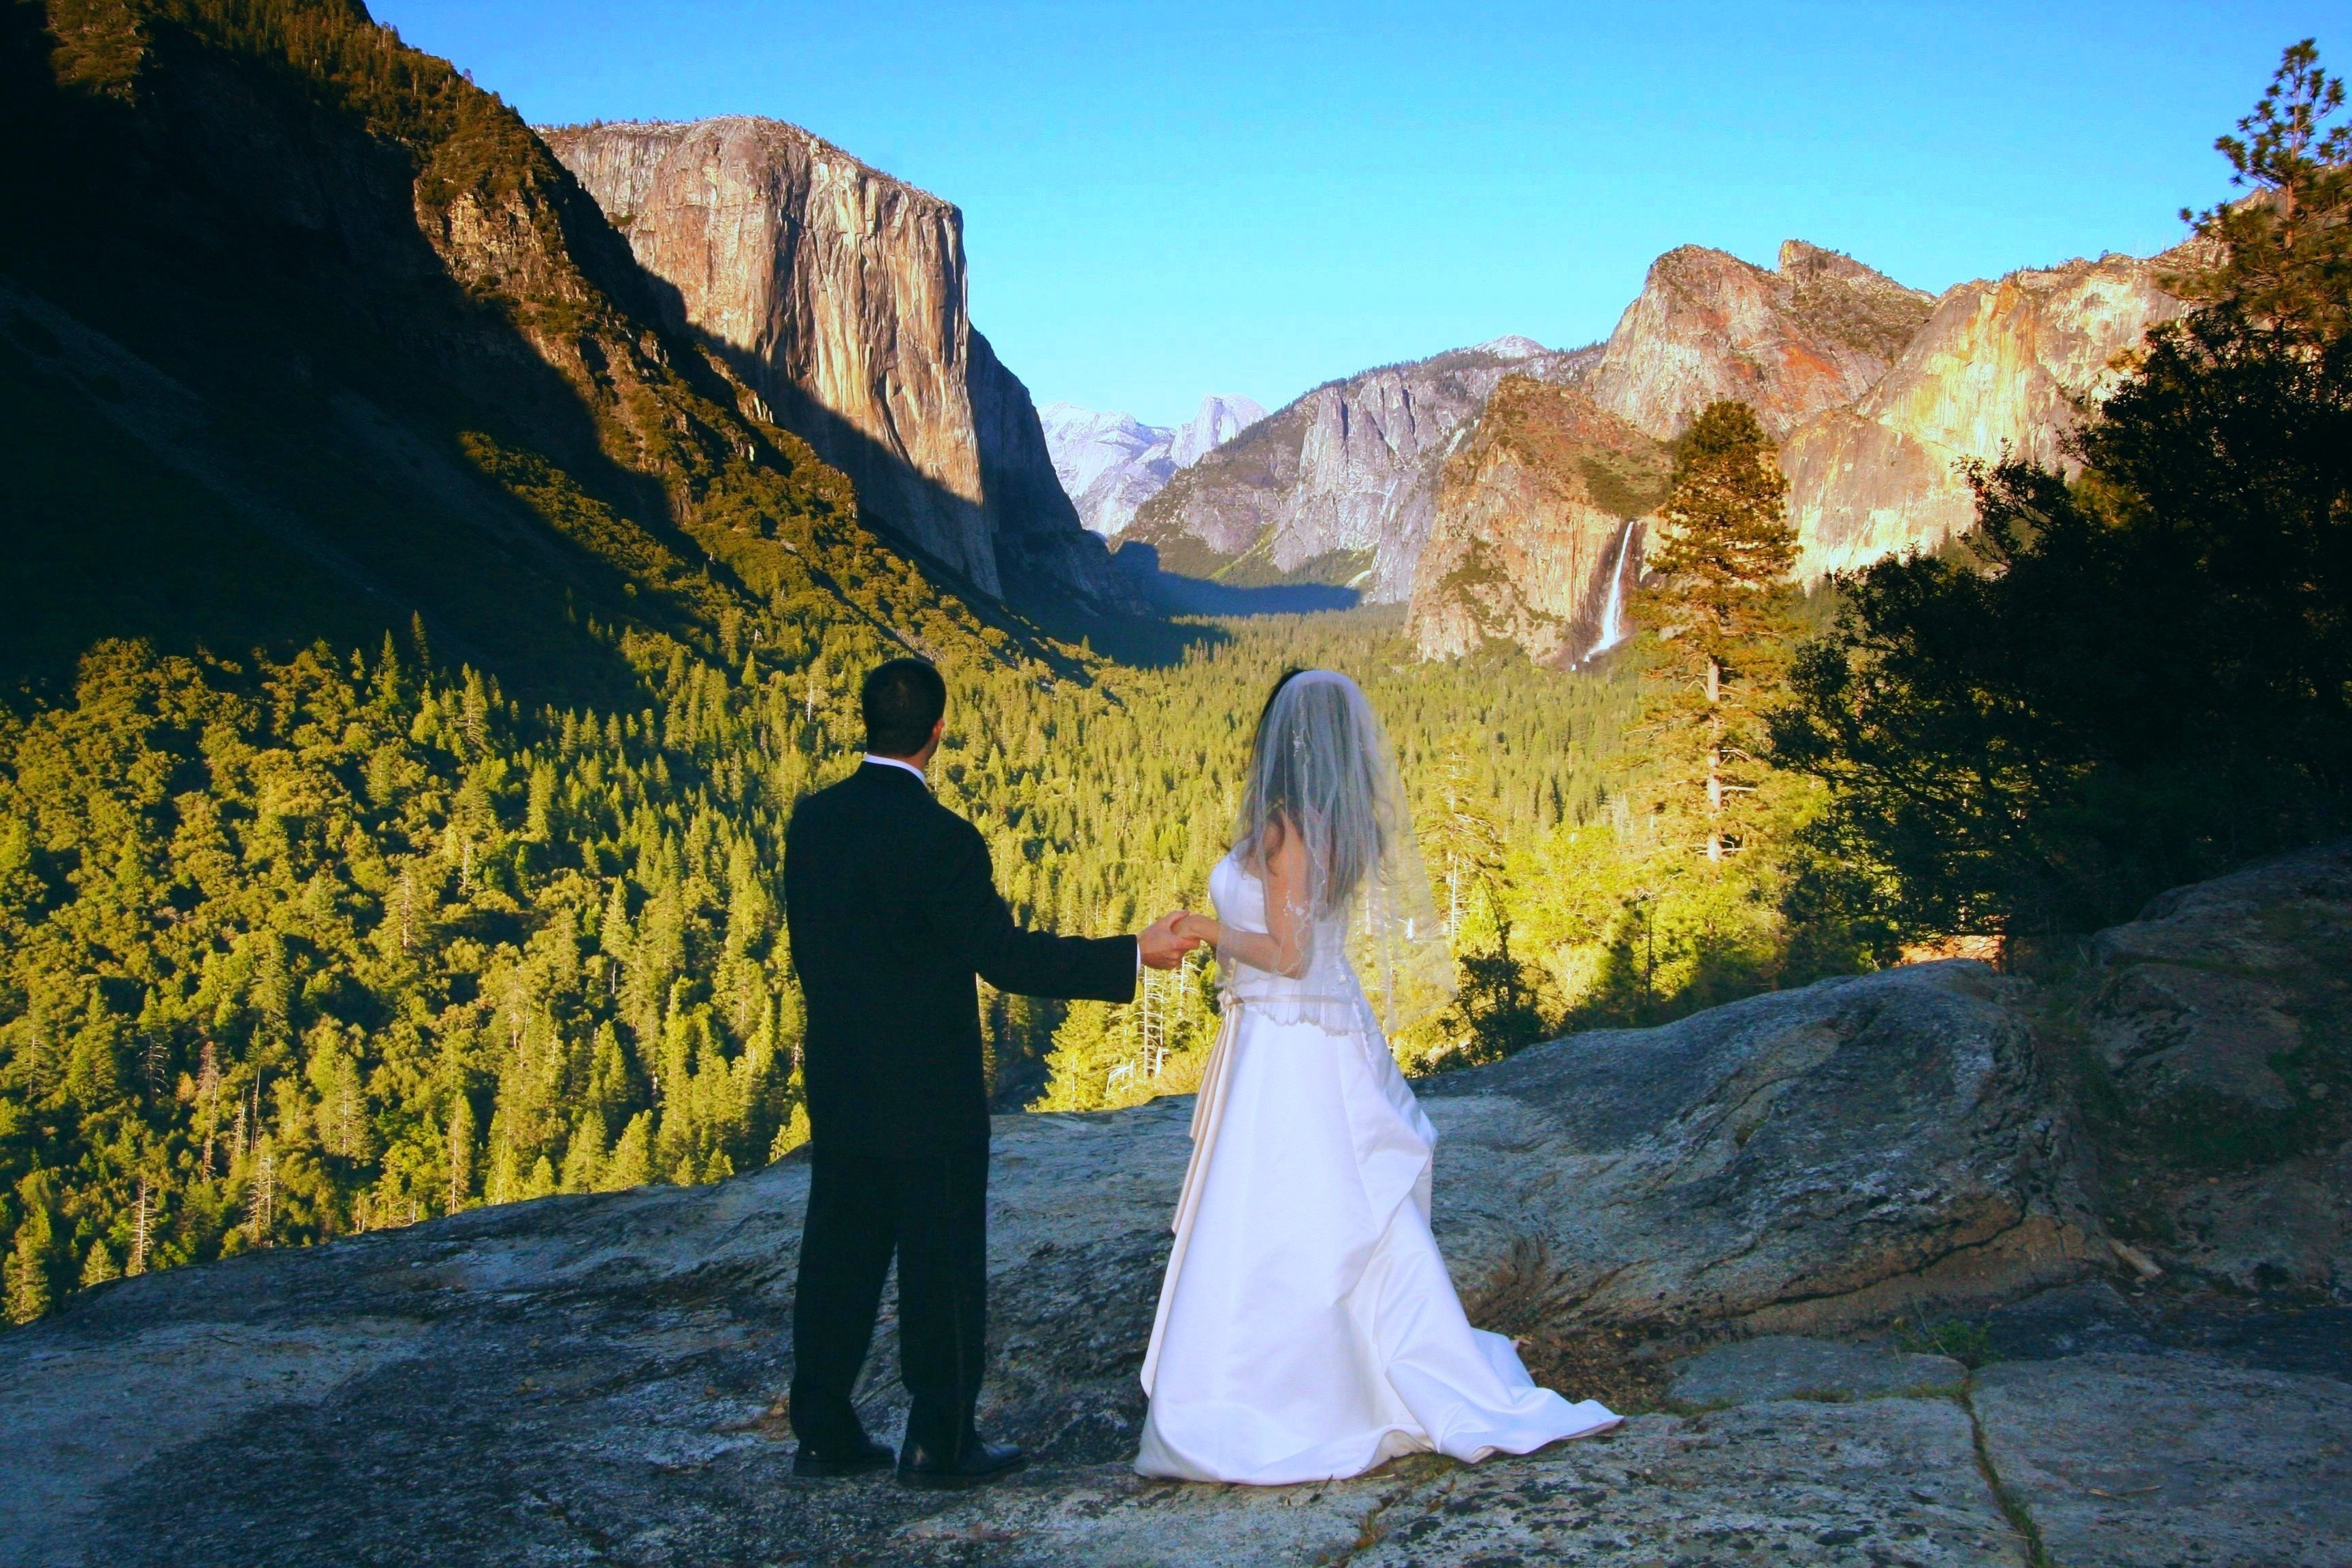 Yosemite Weddings Wedding Ceremonies And Resources